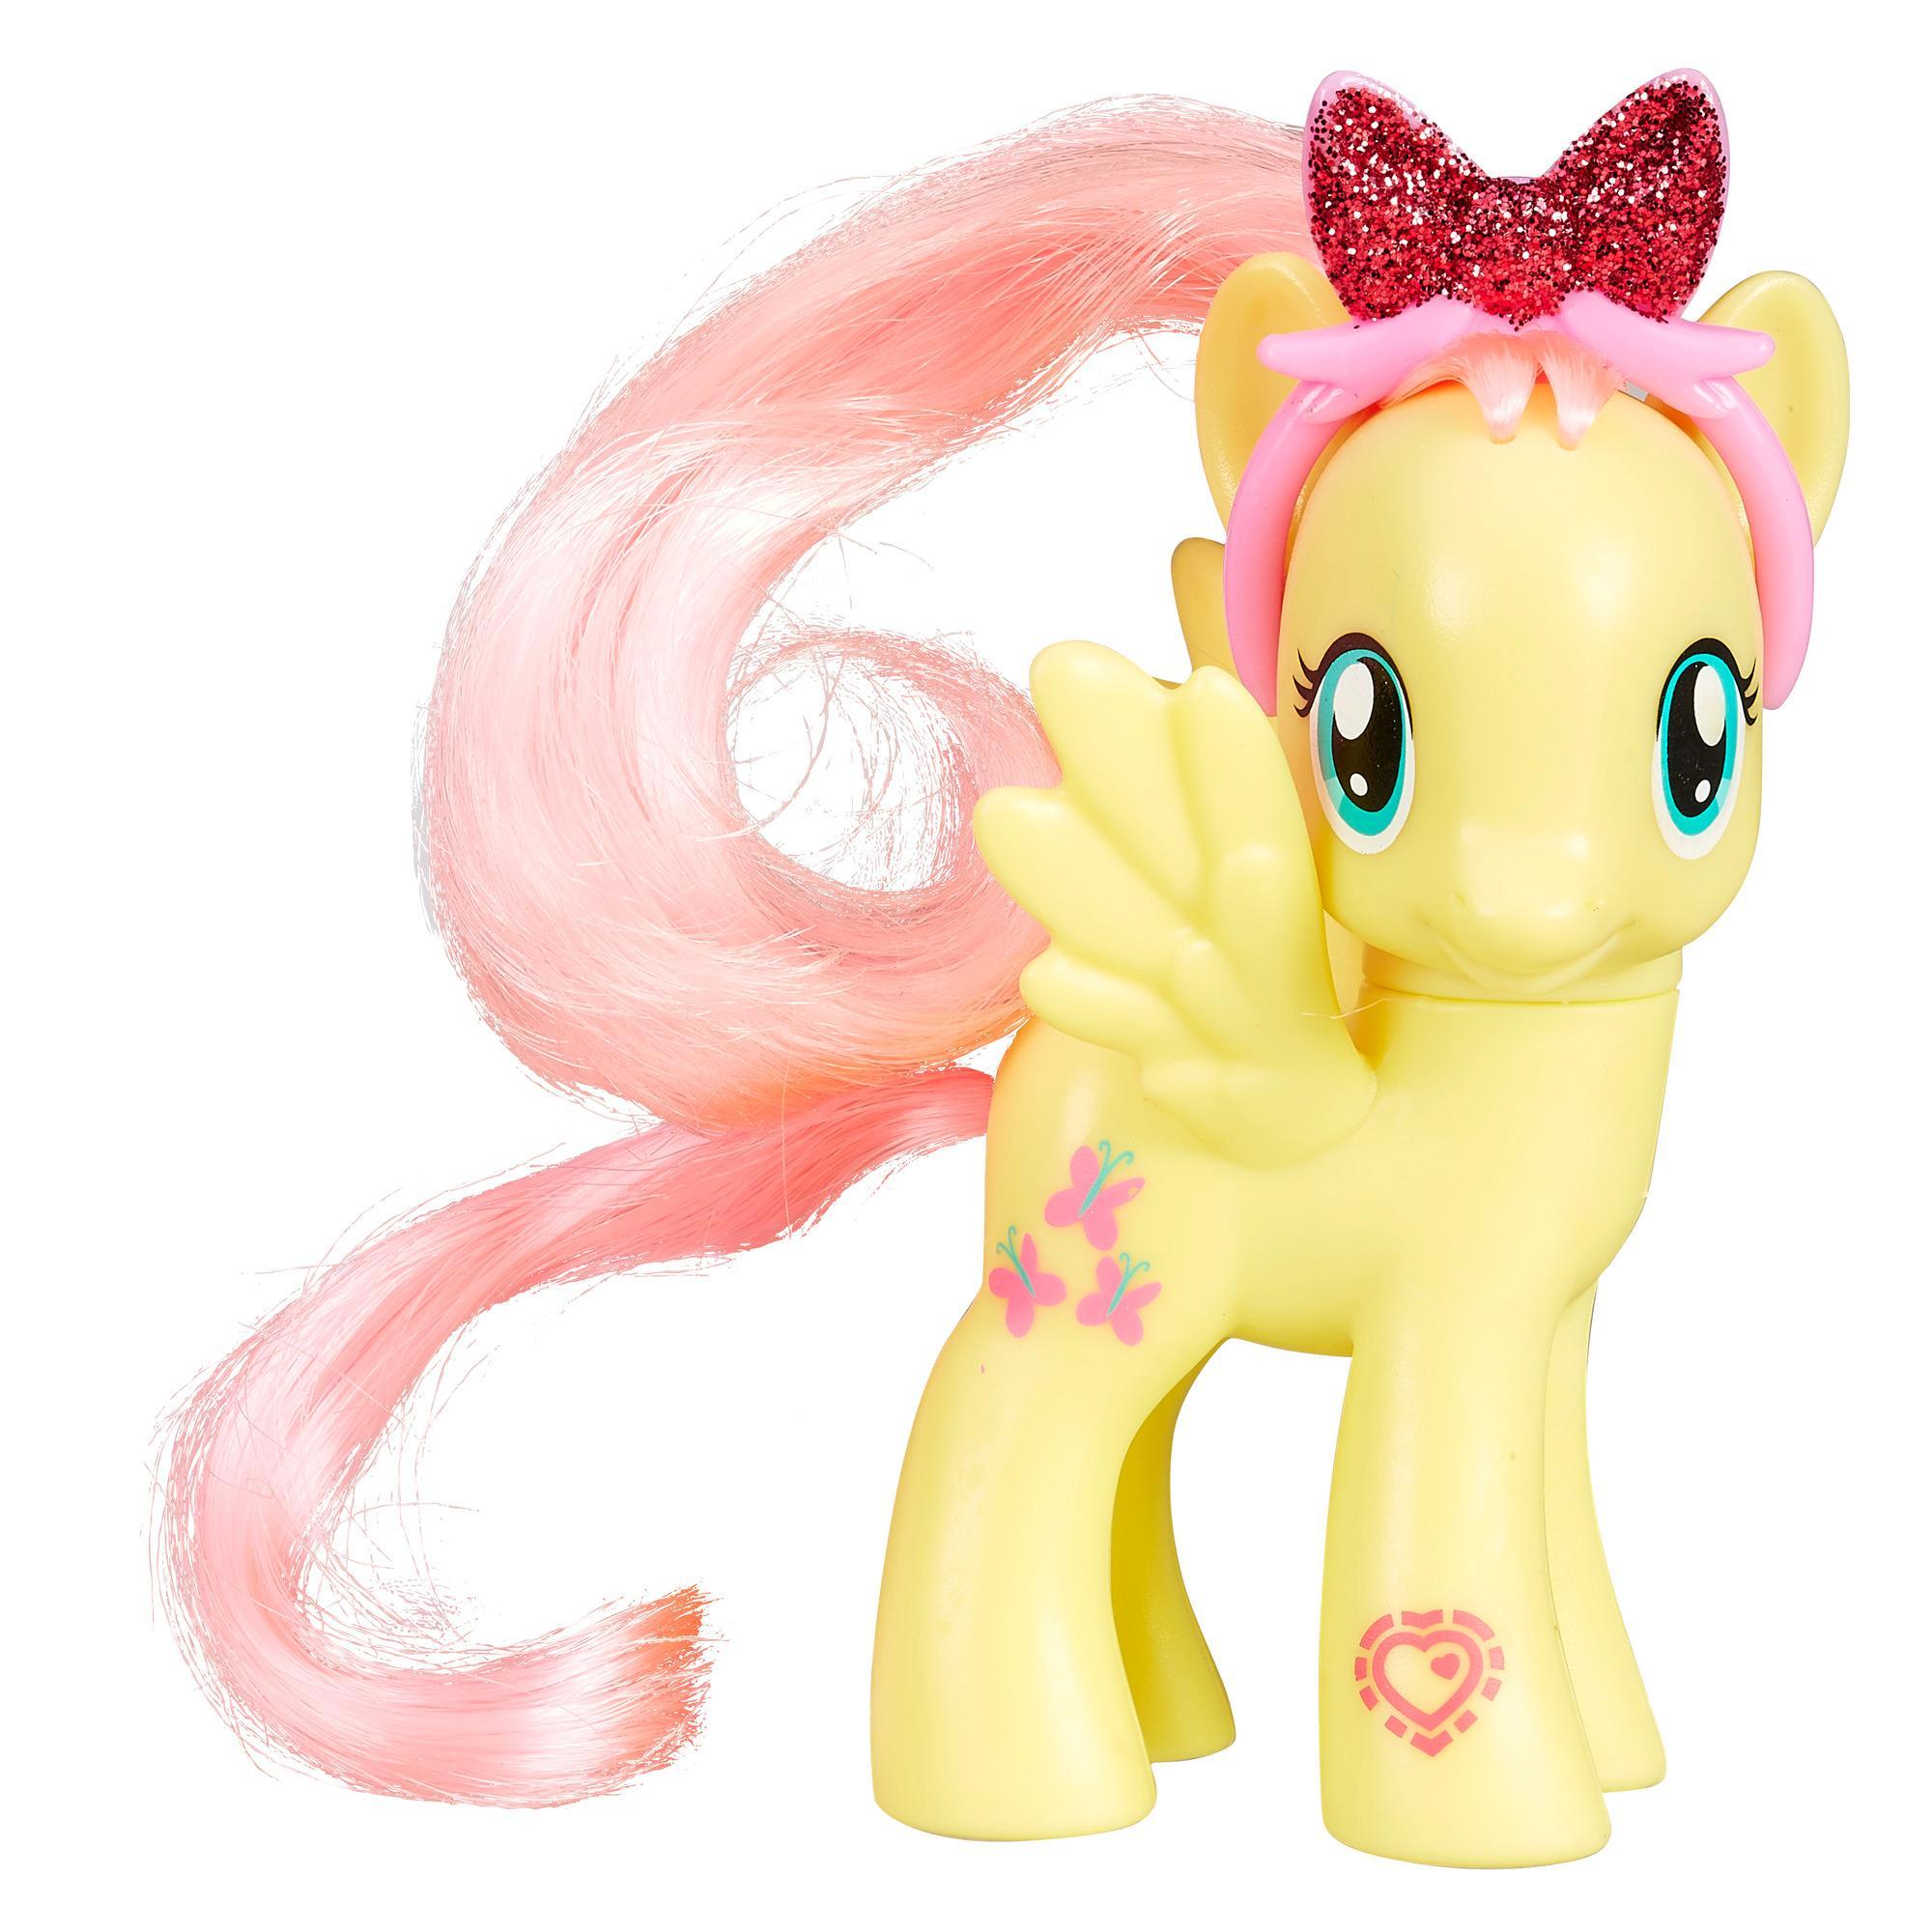 Фигурка пони из серии My Little Pony – ФлаттершайМоя маленькая пони (My Little Pony)<br>Фигурка пони из серии My Little Pony – Флаттершай<br>